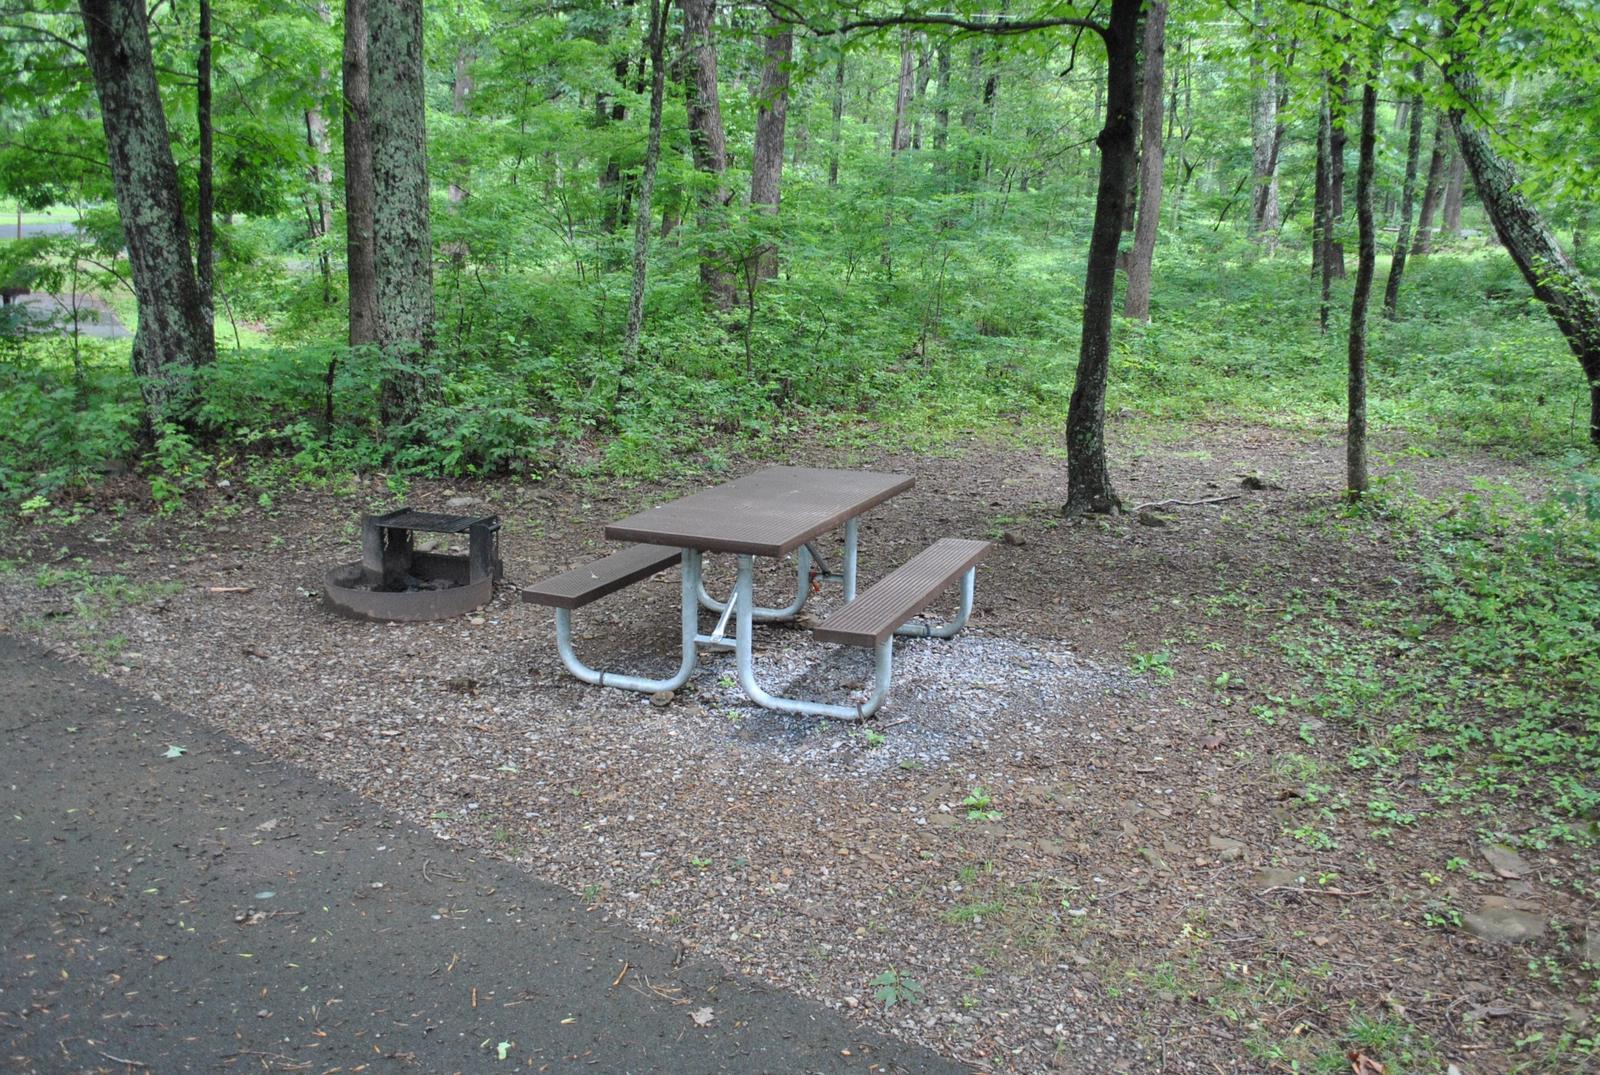 Mathews Arm Campground – Site A022